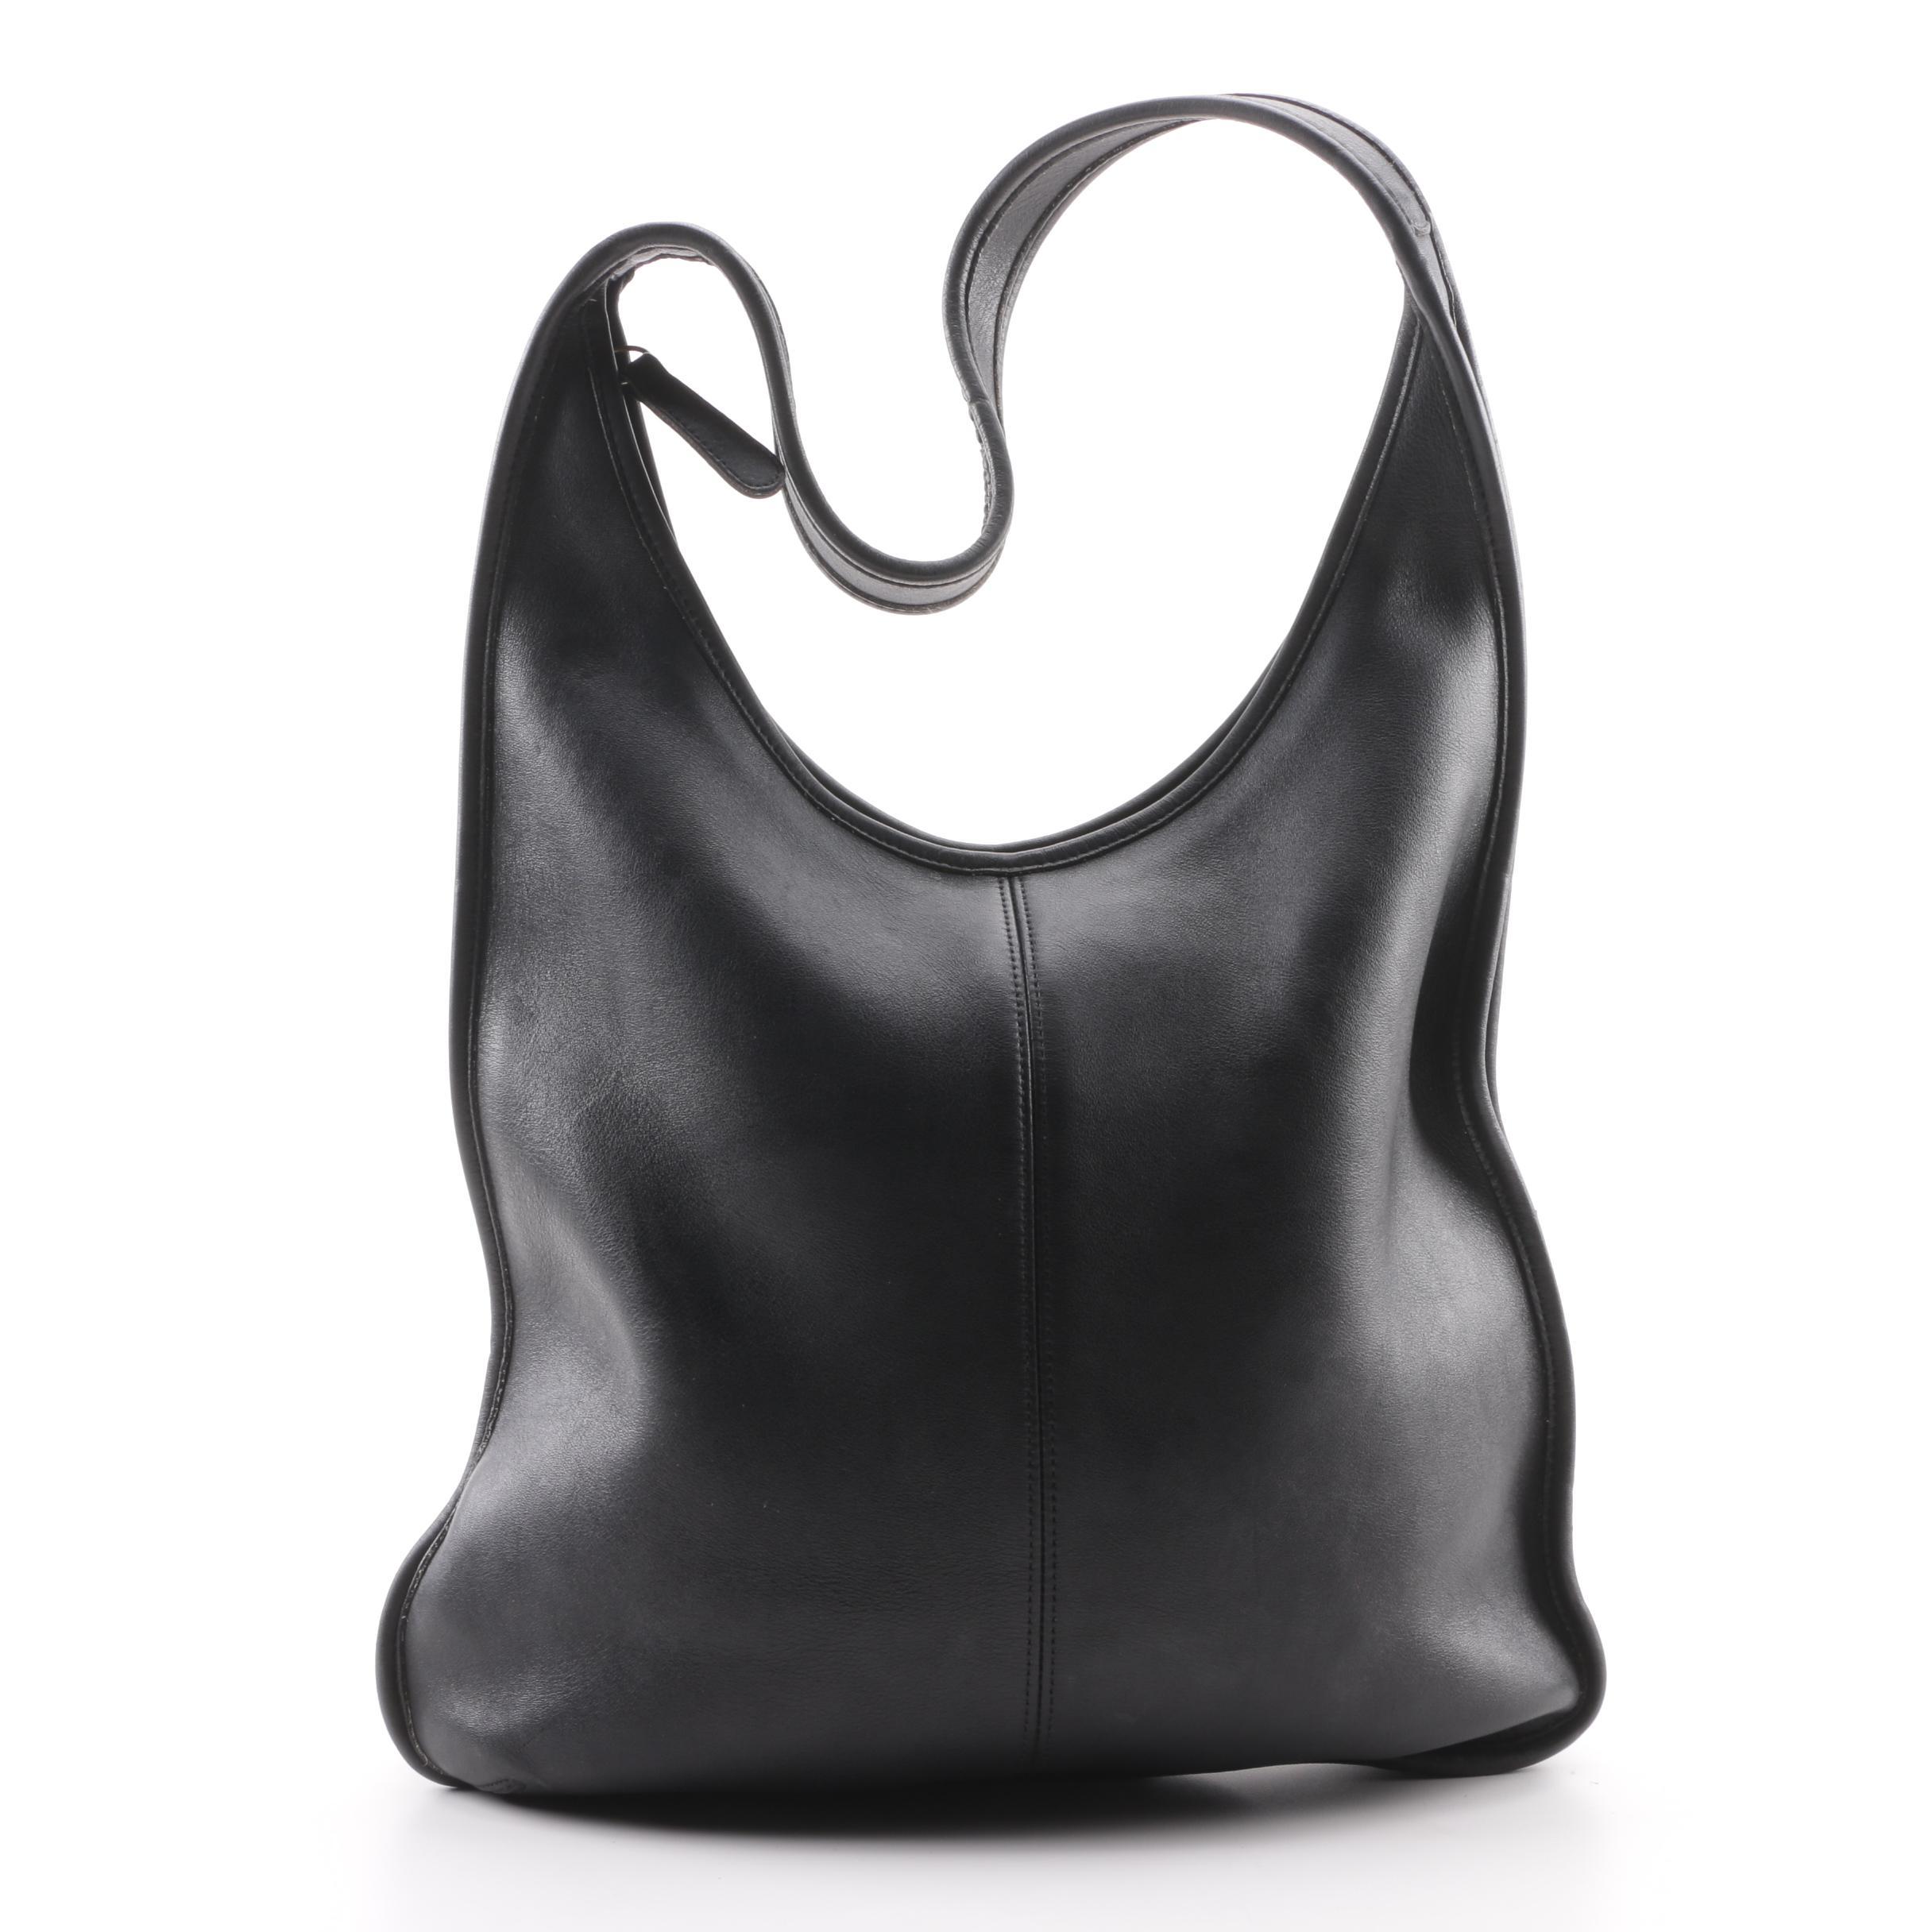 0f3eba32467 italy 1997 vintage coach black leather hobo bag e40f9 e05d5